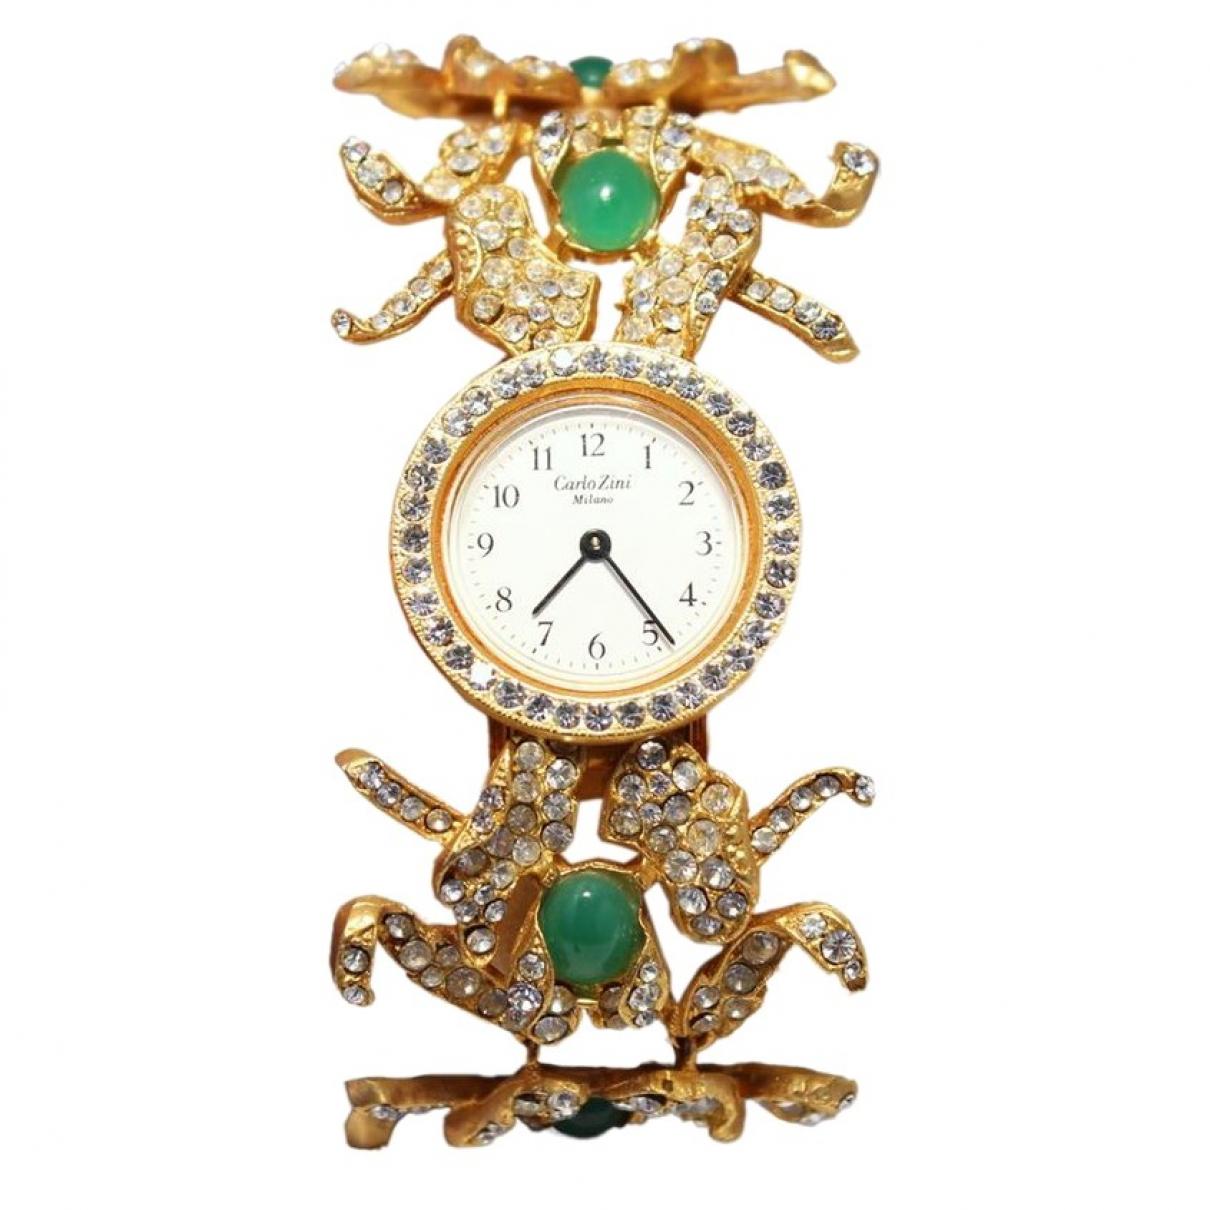 Carlo Zini \N Uhr in  Gold Vergoldet